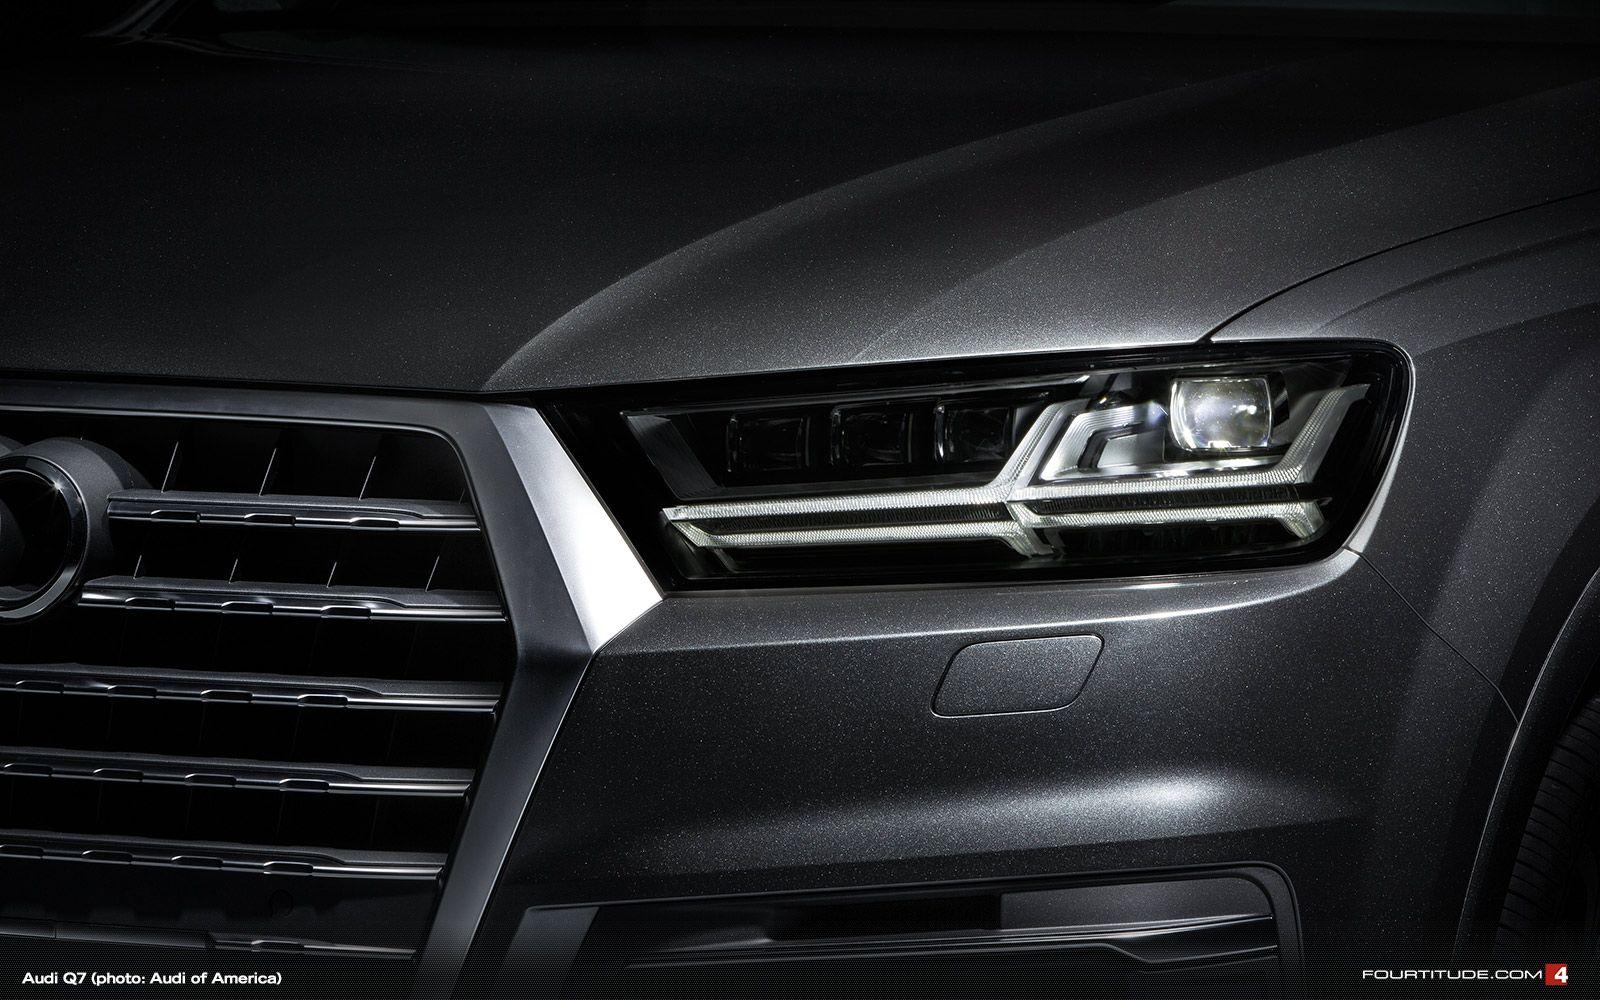 Audi Q7 Headlamp Audi Autos Led